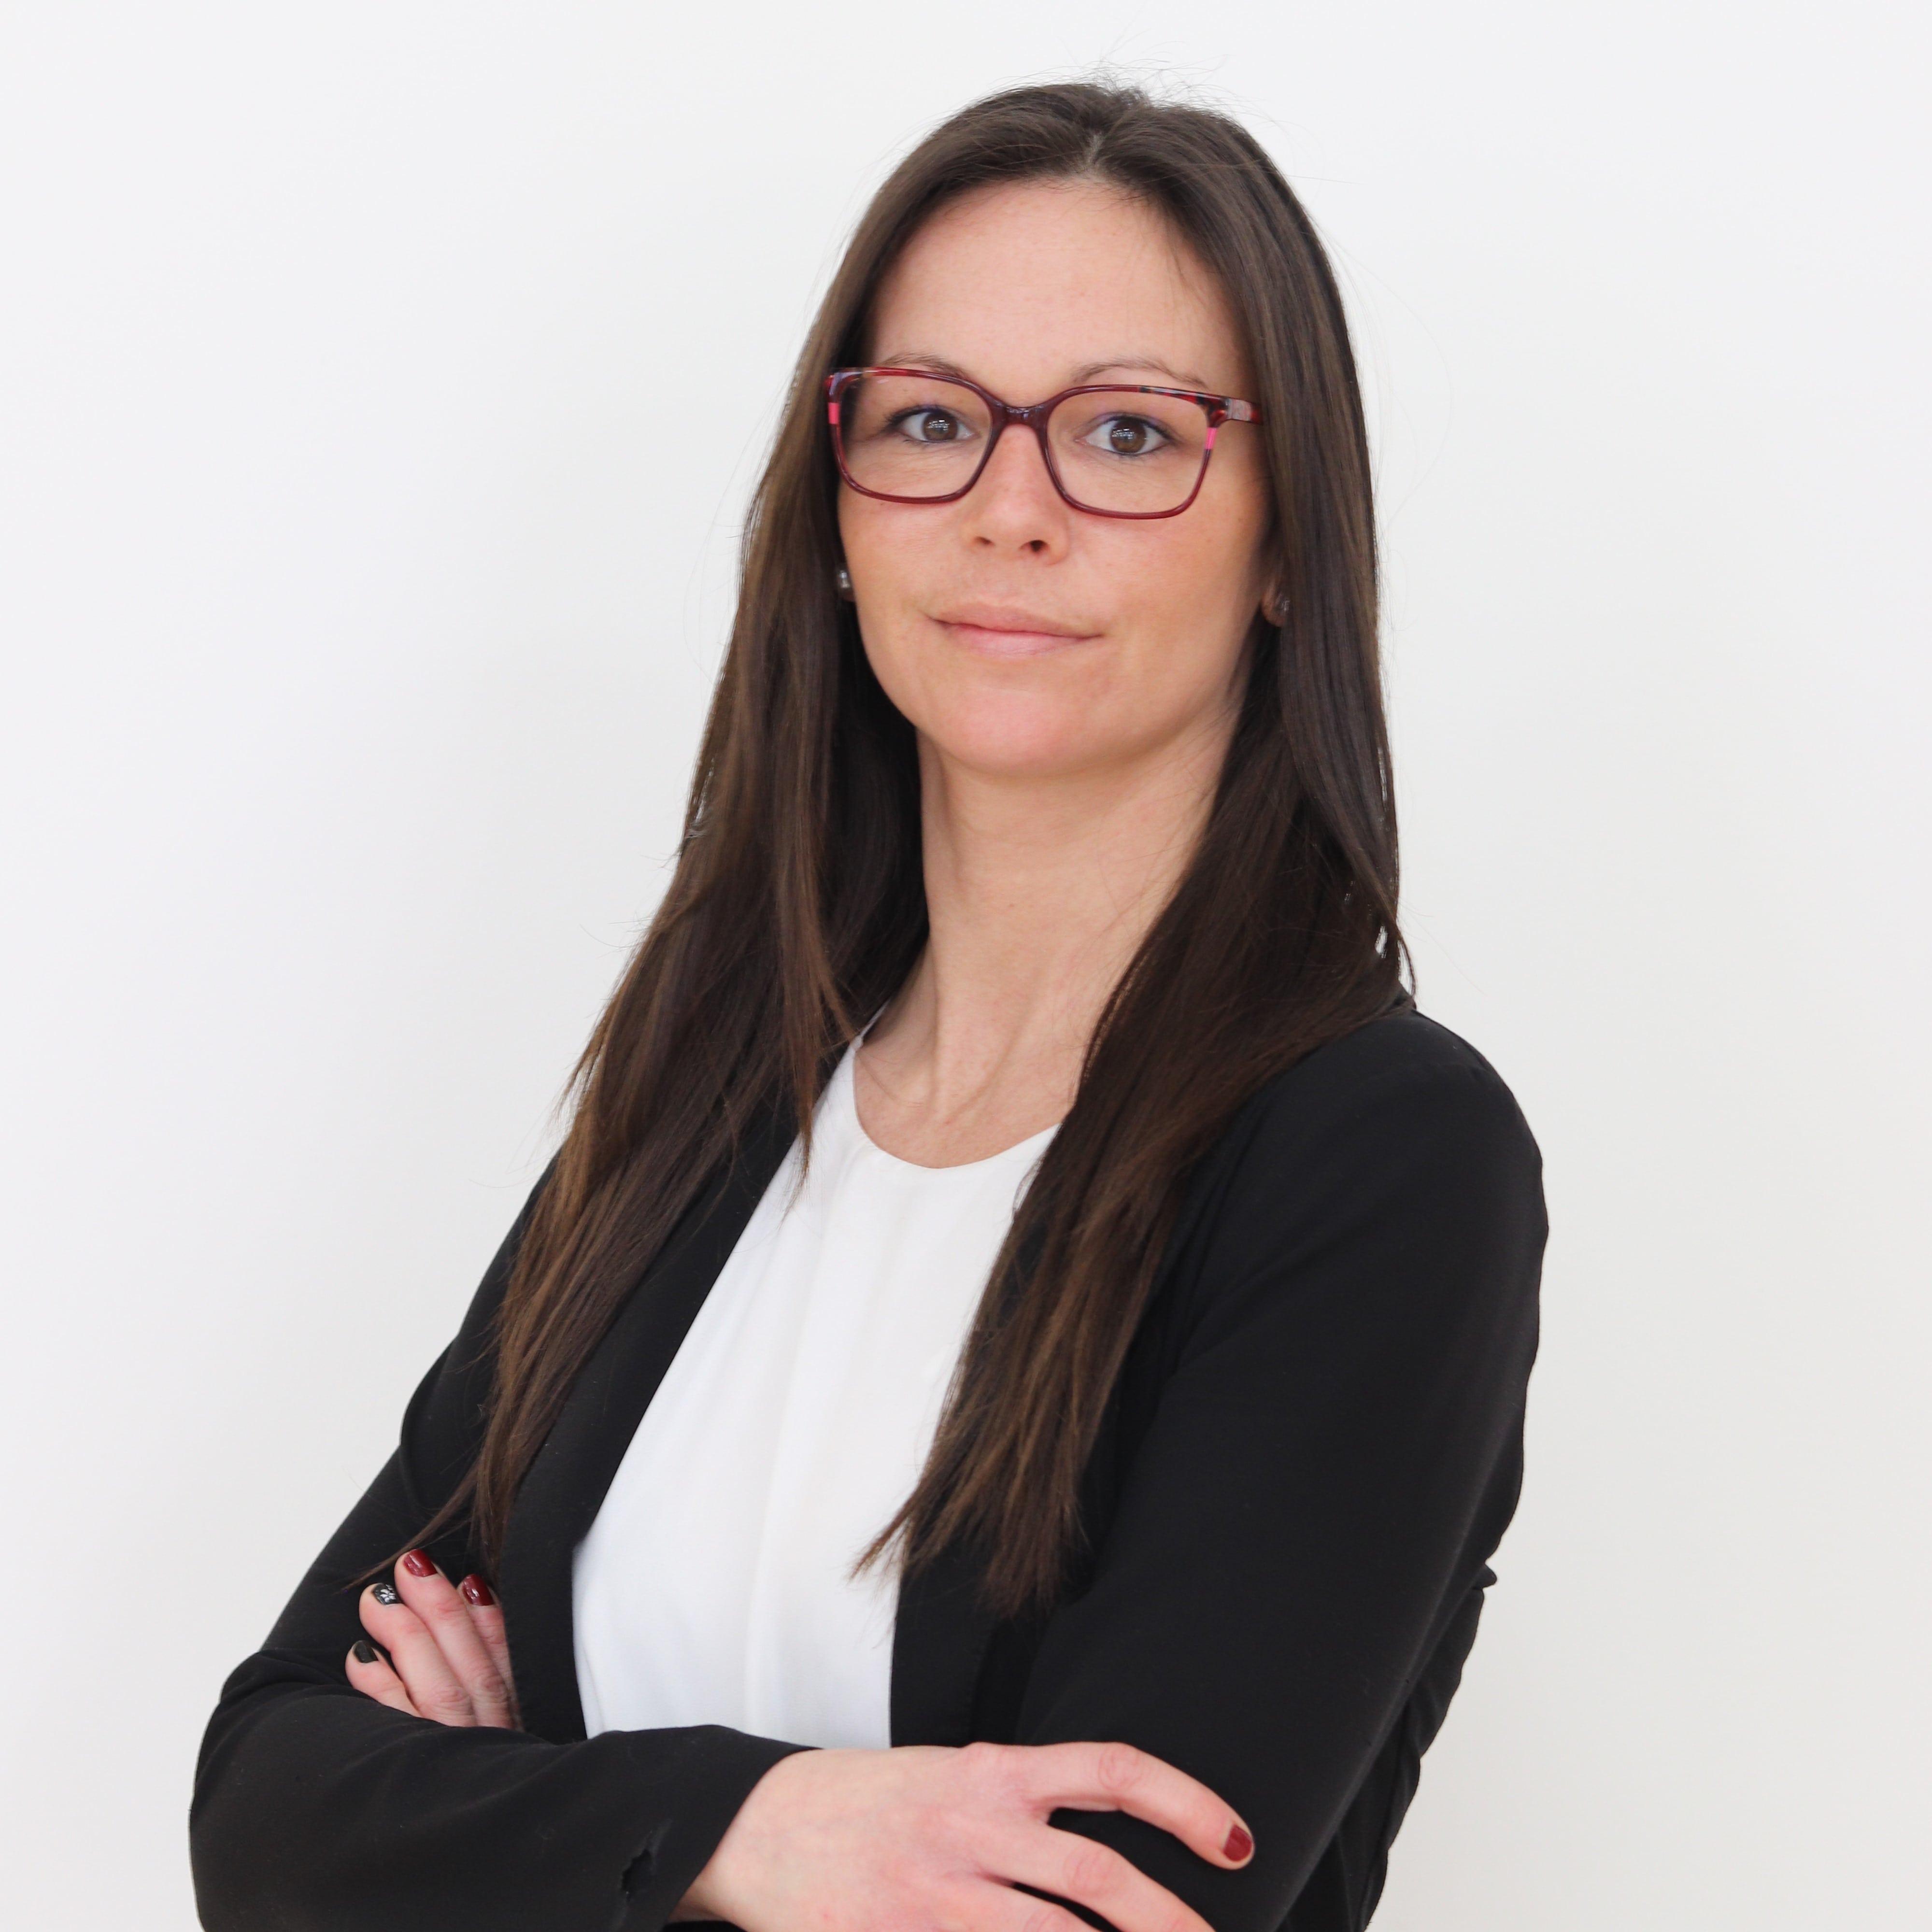 Vanessa Létourneau